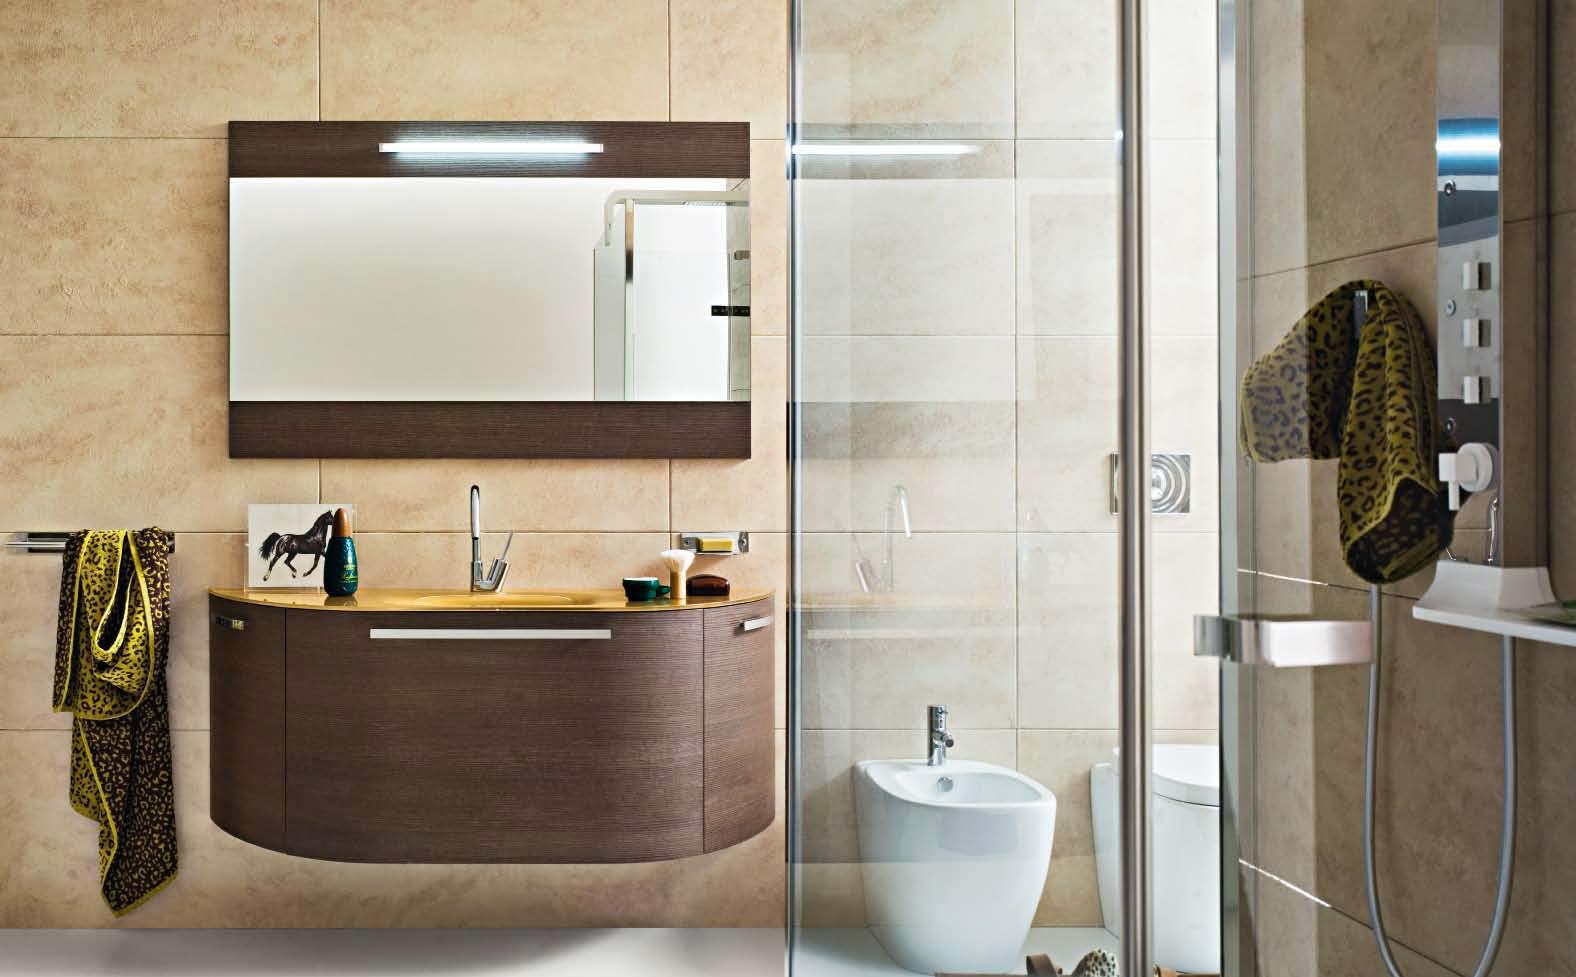 bathroom designers large and beautiful photos photo to select bathroom designers